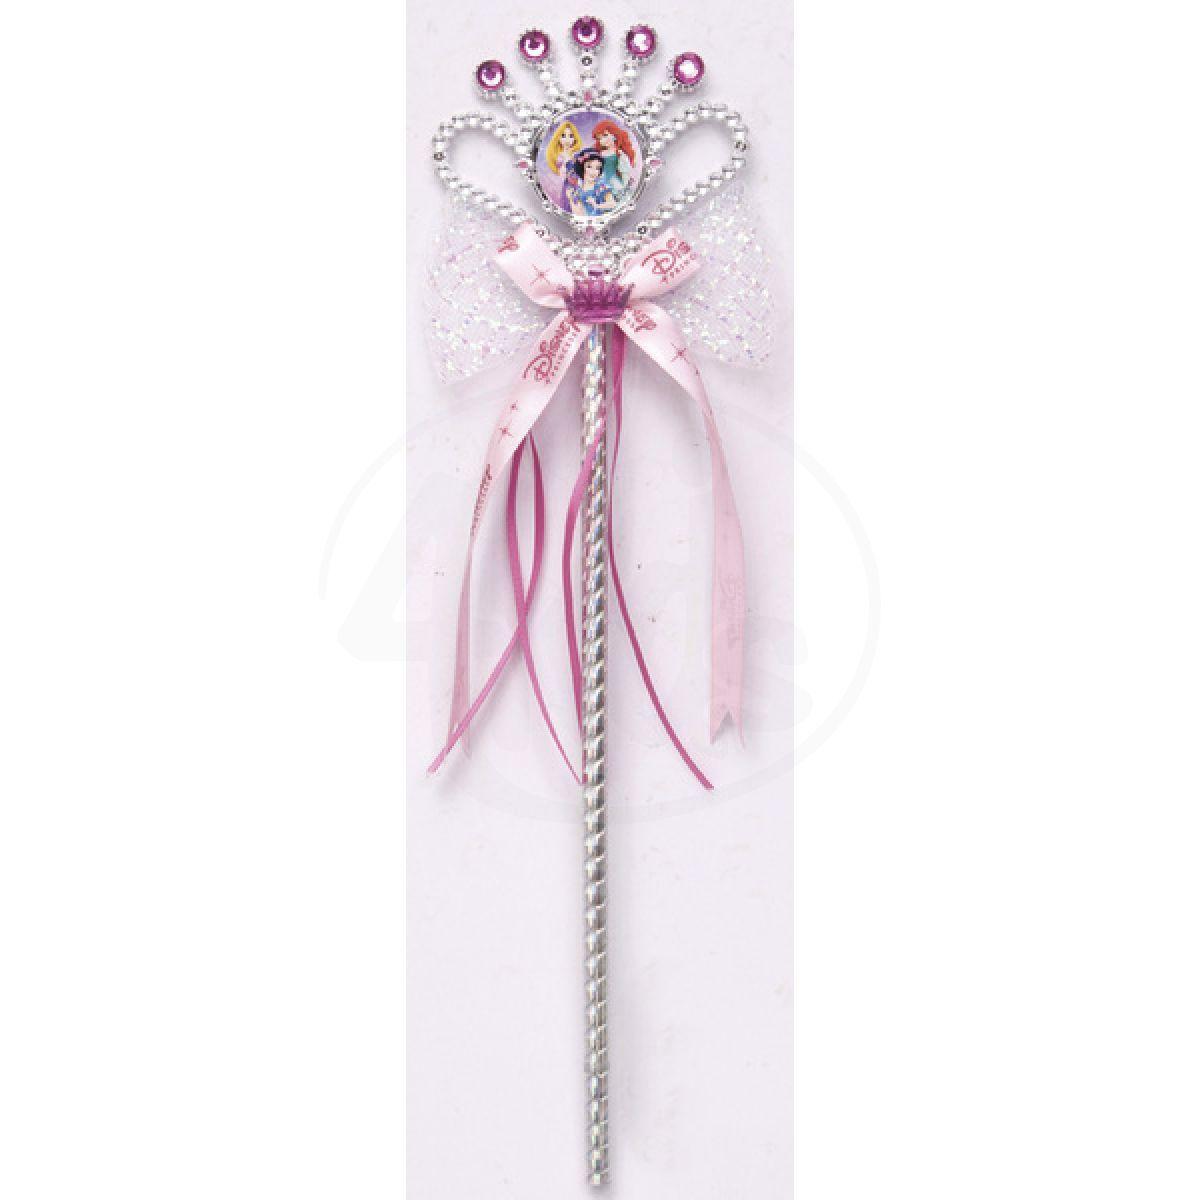 Disney princezny Hůlka pro princeznu 3760225089